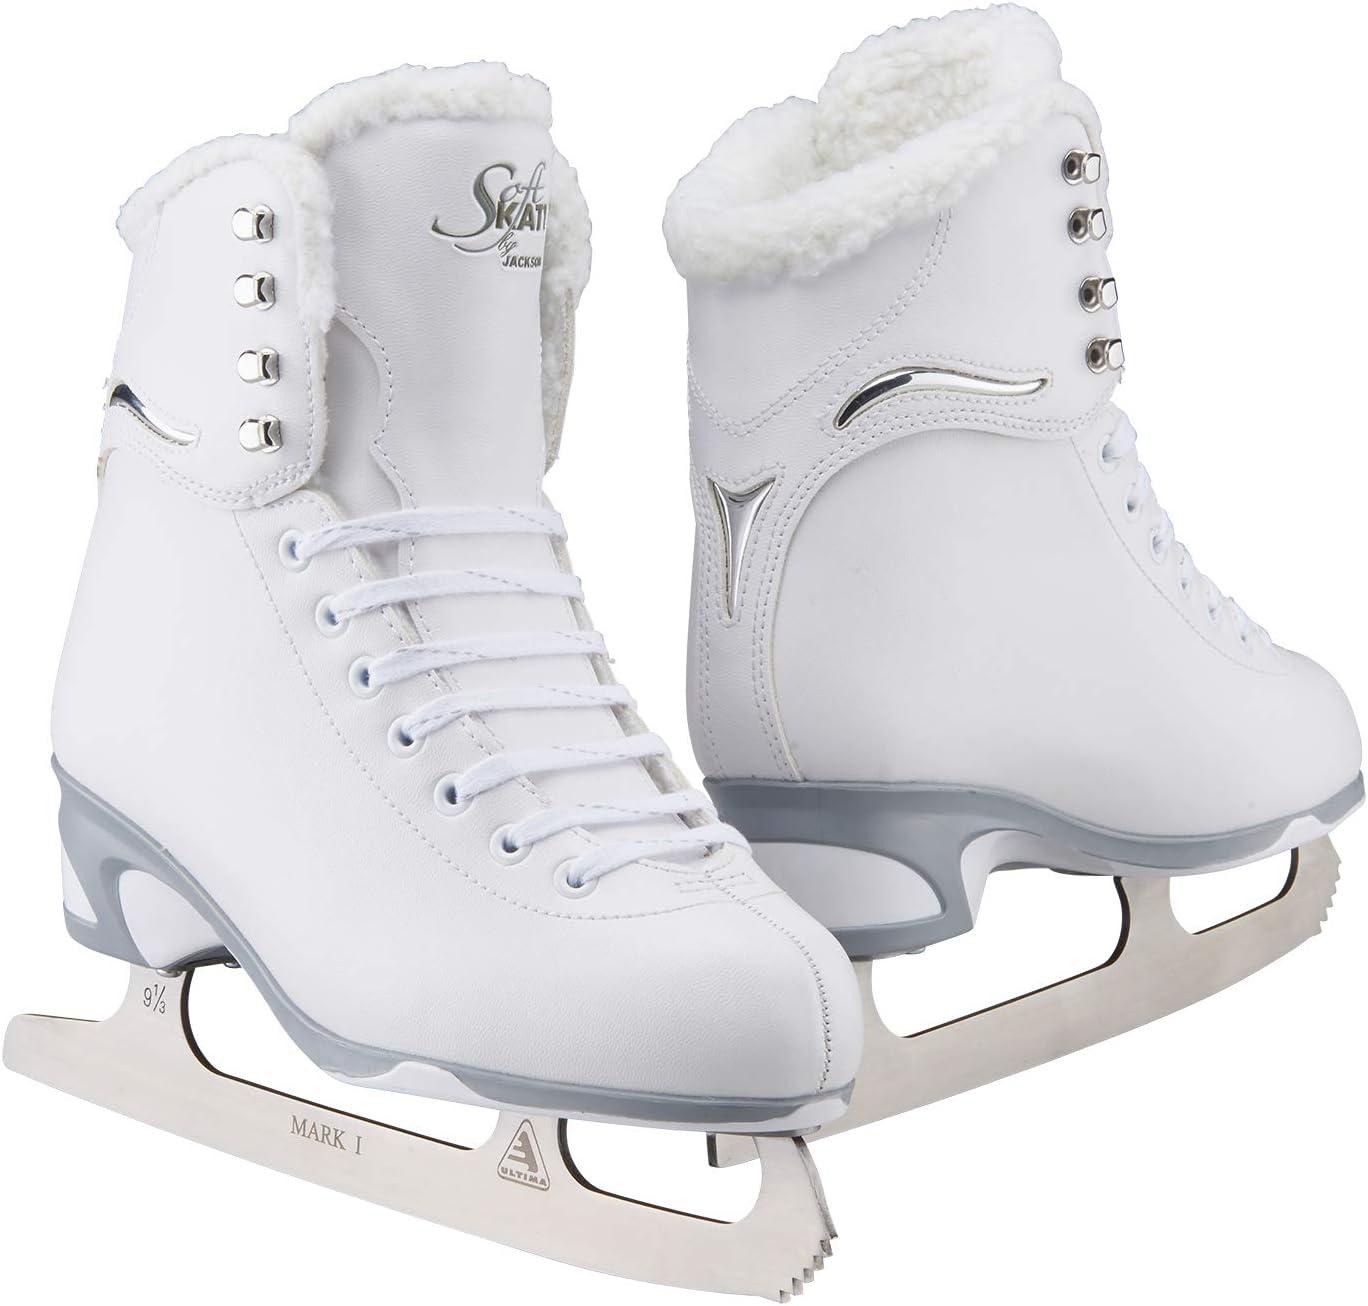 Best Figure Skates for women: Jackson Ultima Finesse Figure Skates